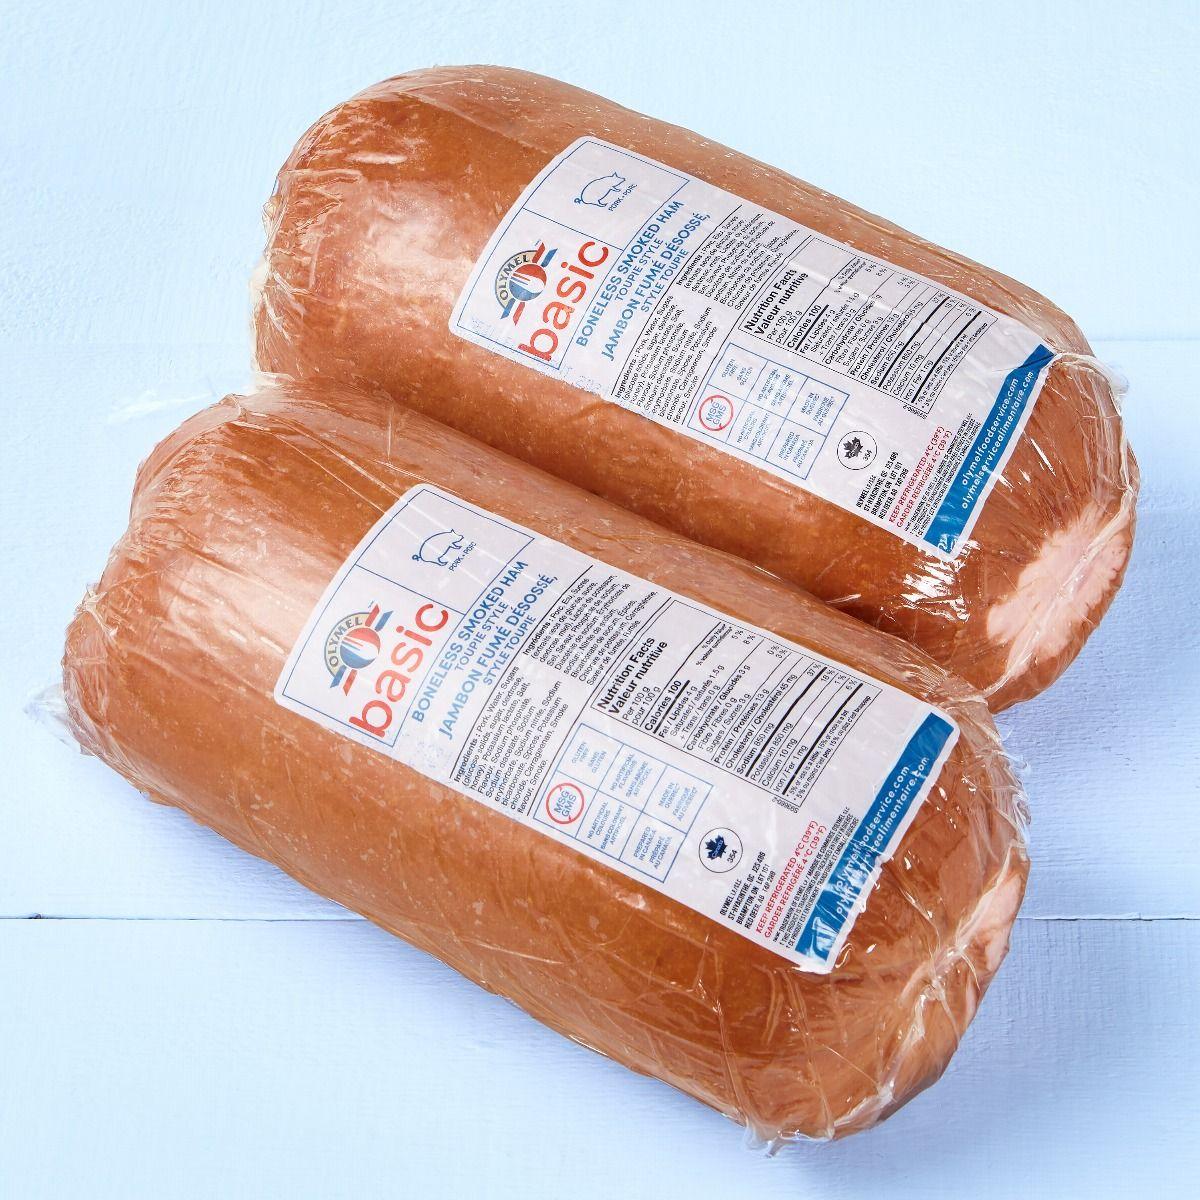 Toupie style boneless smoked ham